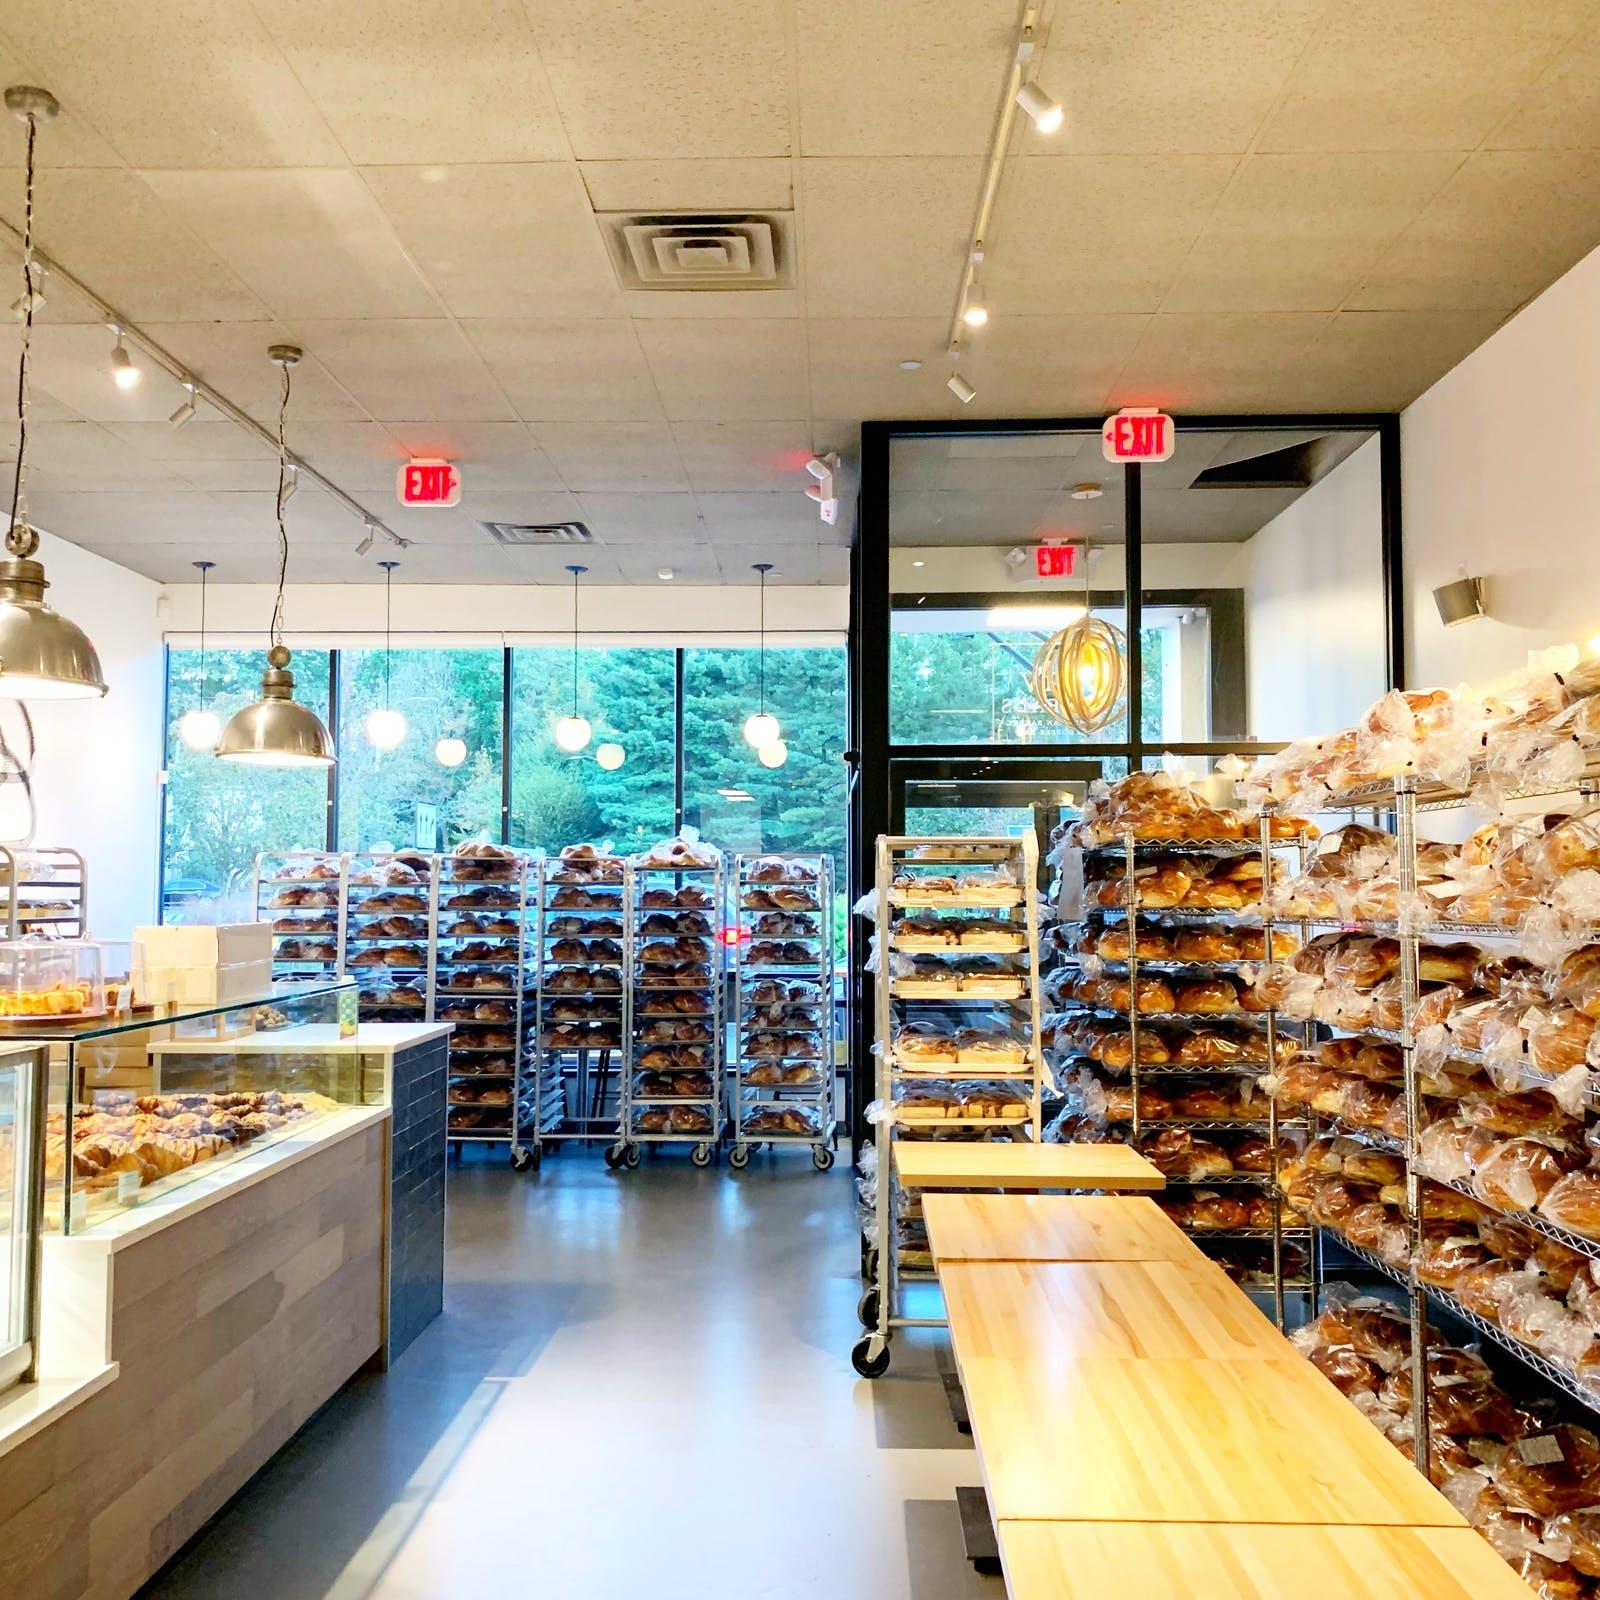 A bakery full of bread.